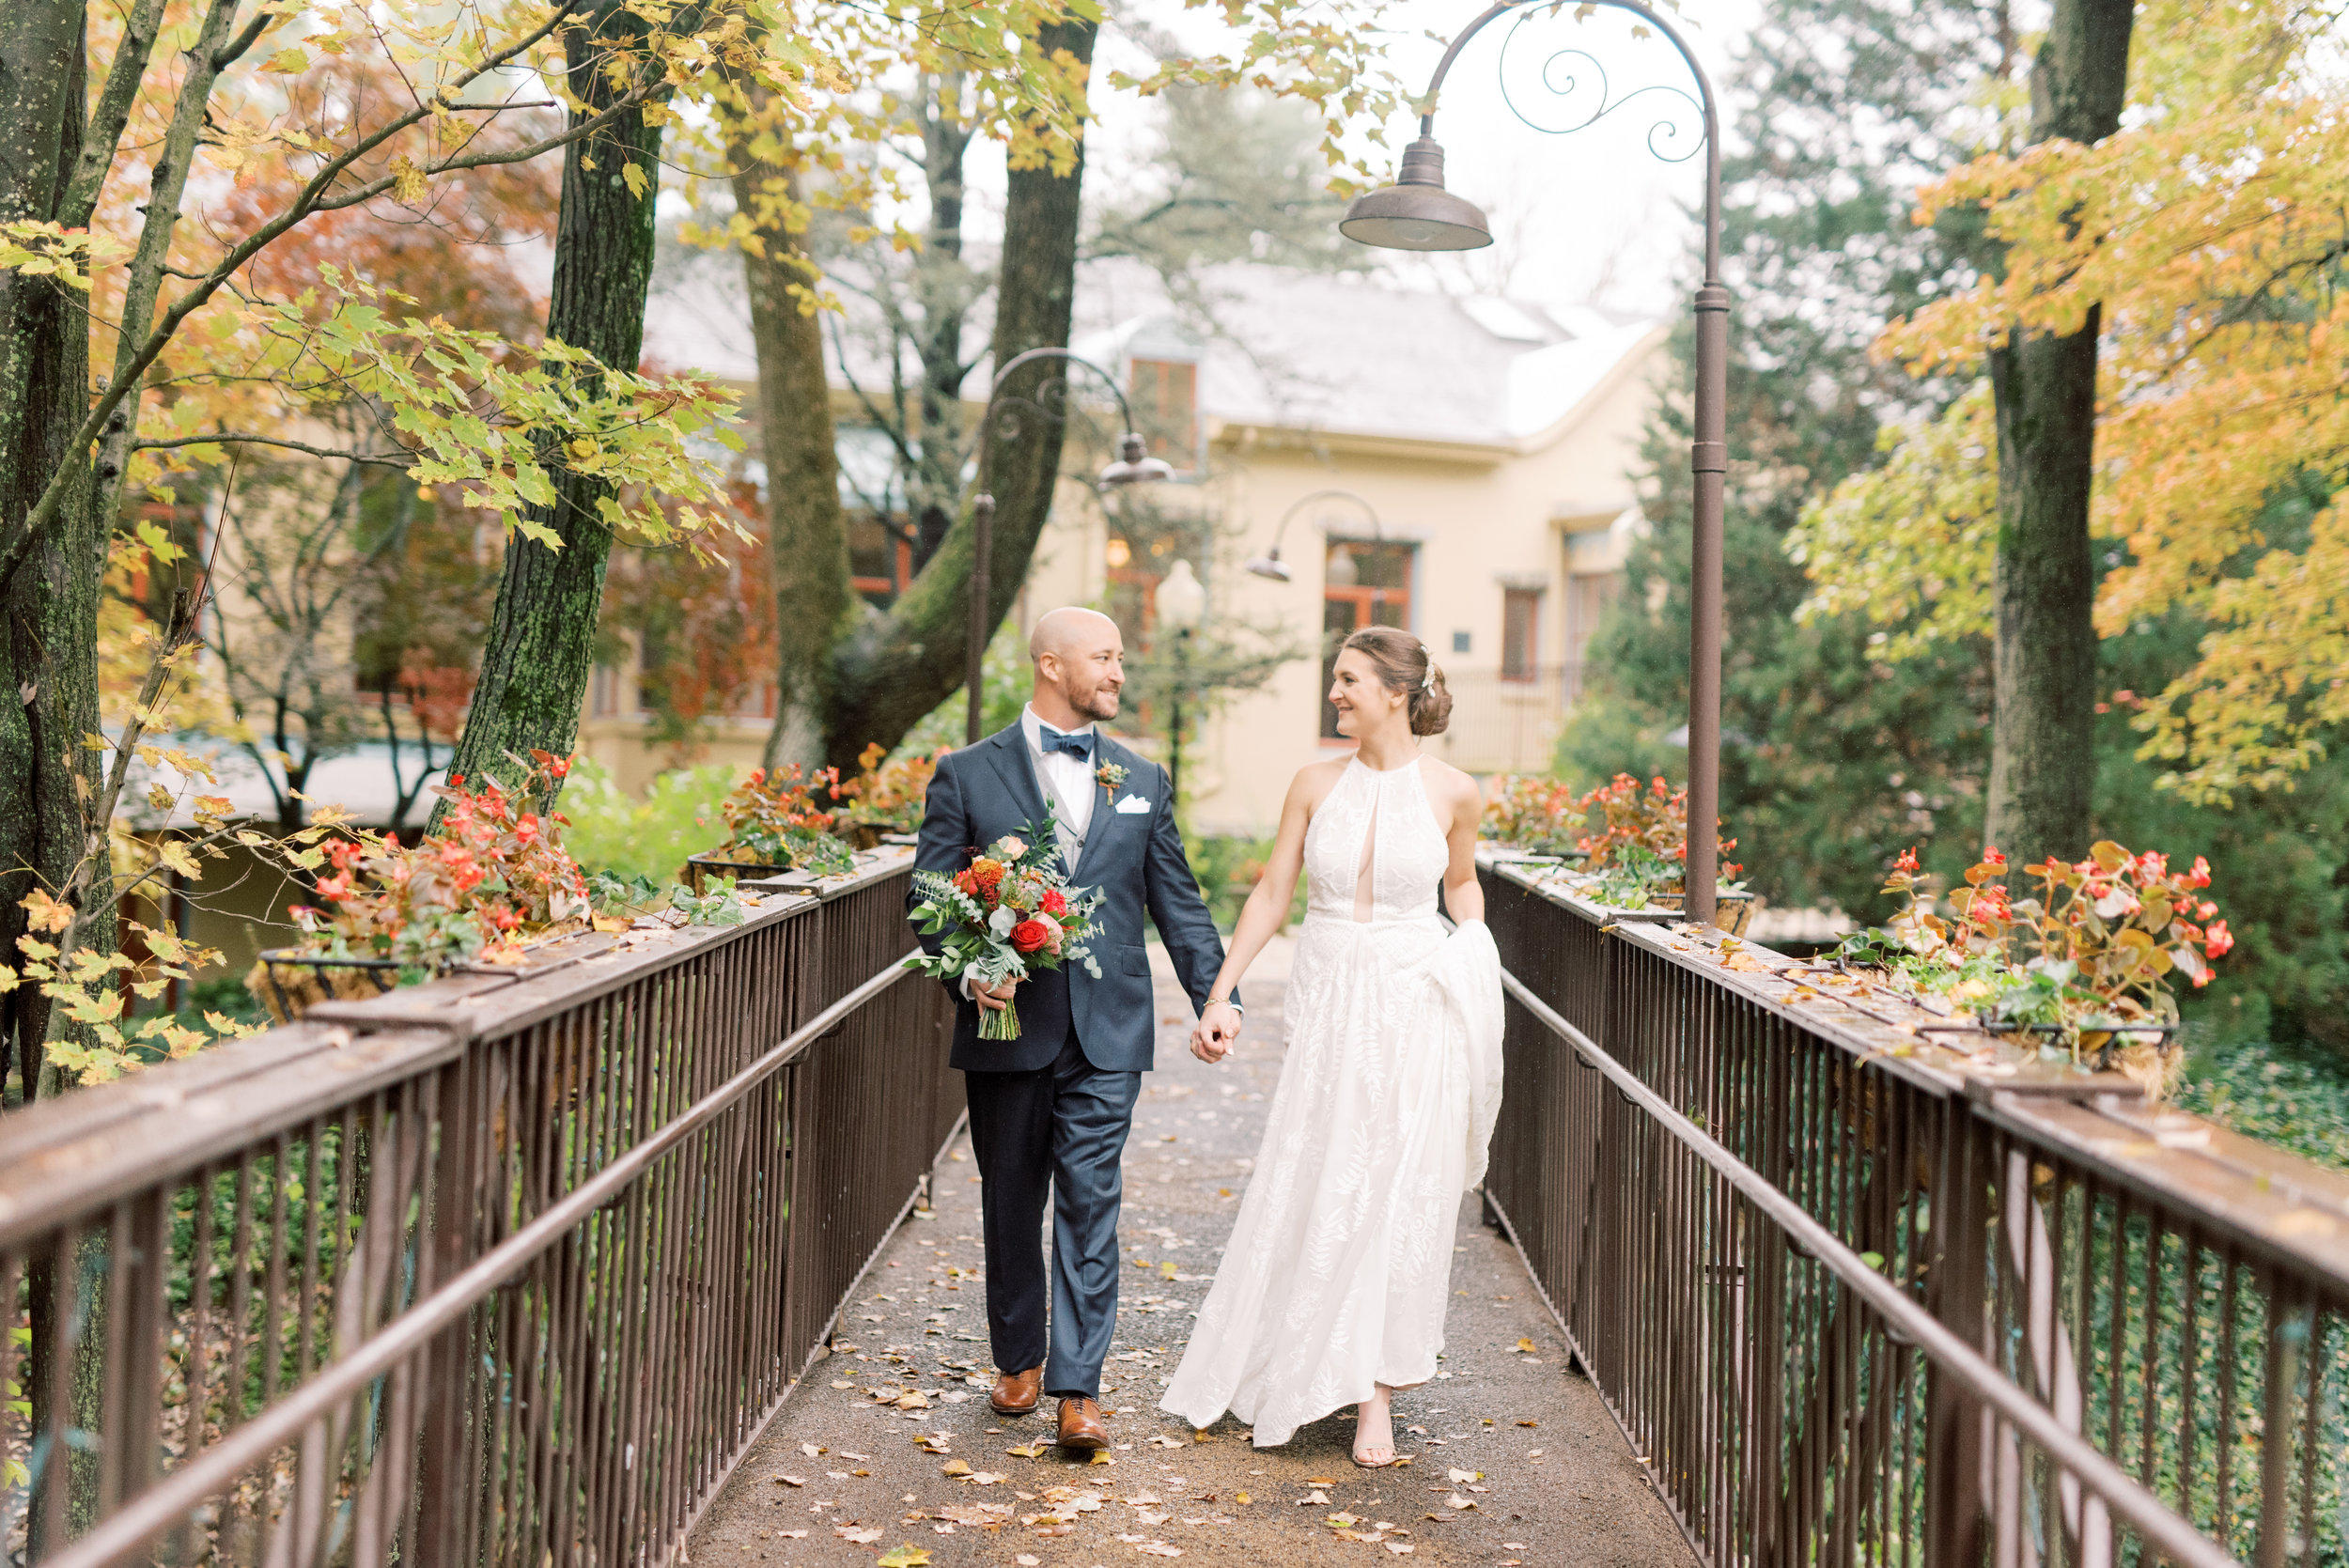 haley-richter-photography-october-pomme-wedding-in-radnor-053.jpg